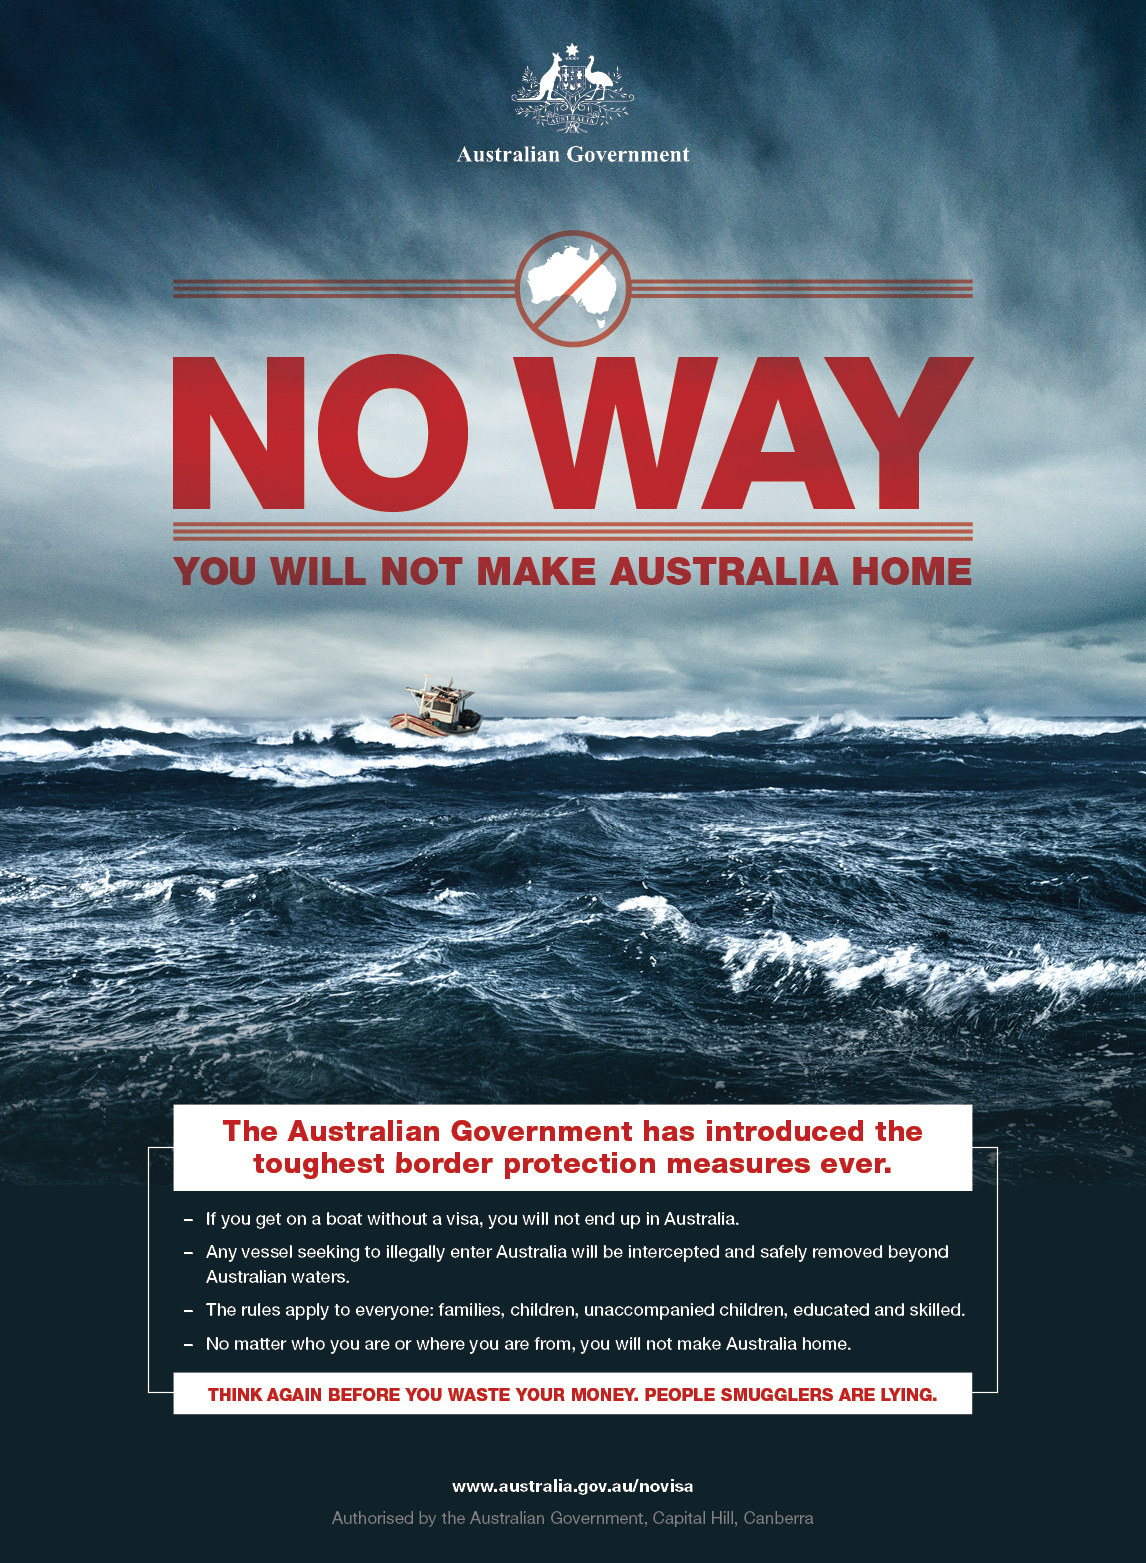 Campagne No Way - anti-migrants - Australie